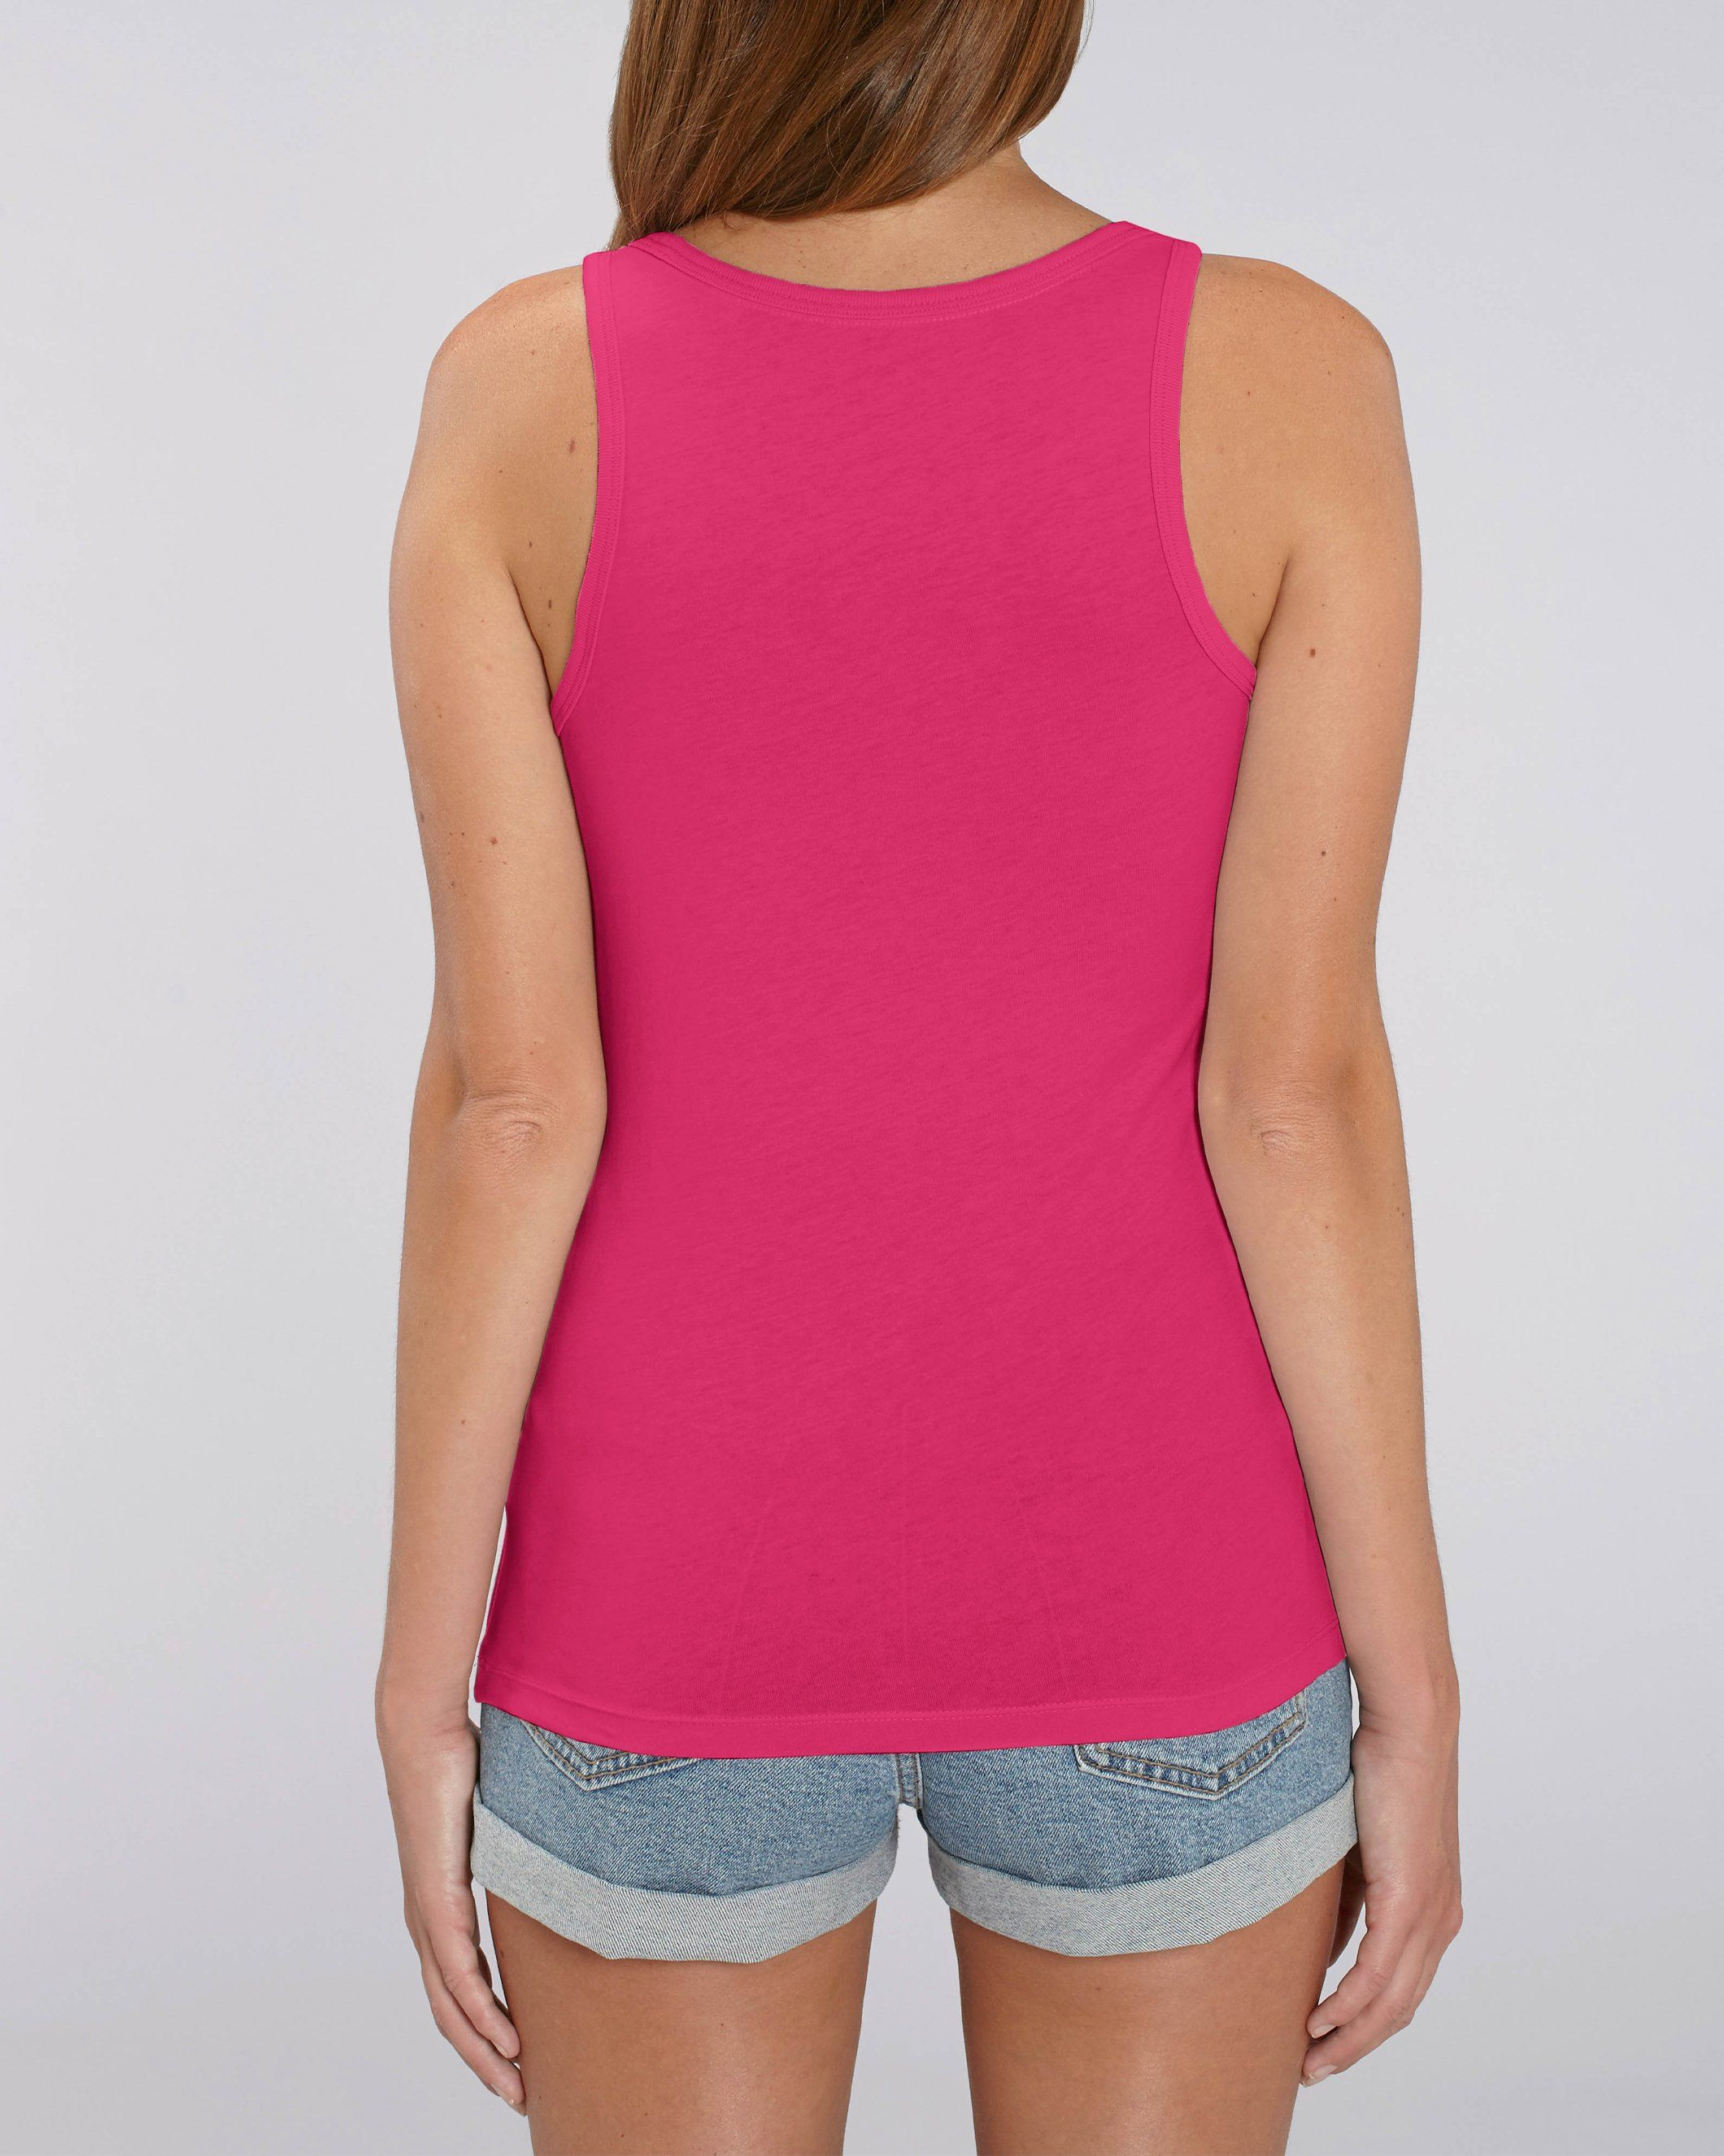 Catch Women's Tank Top in Pink